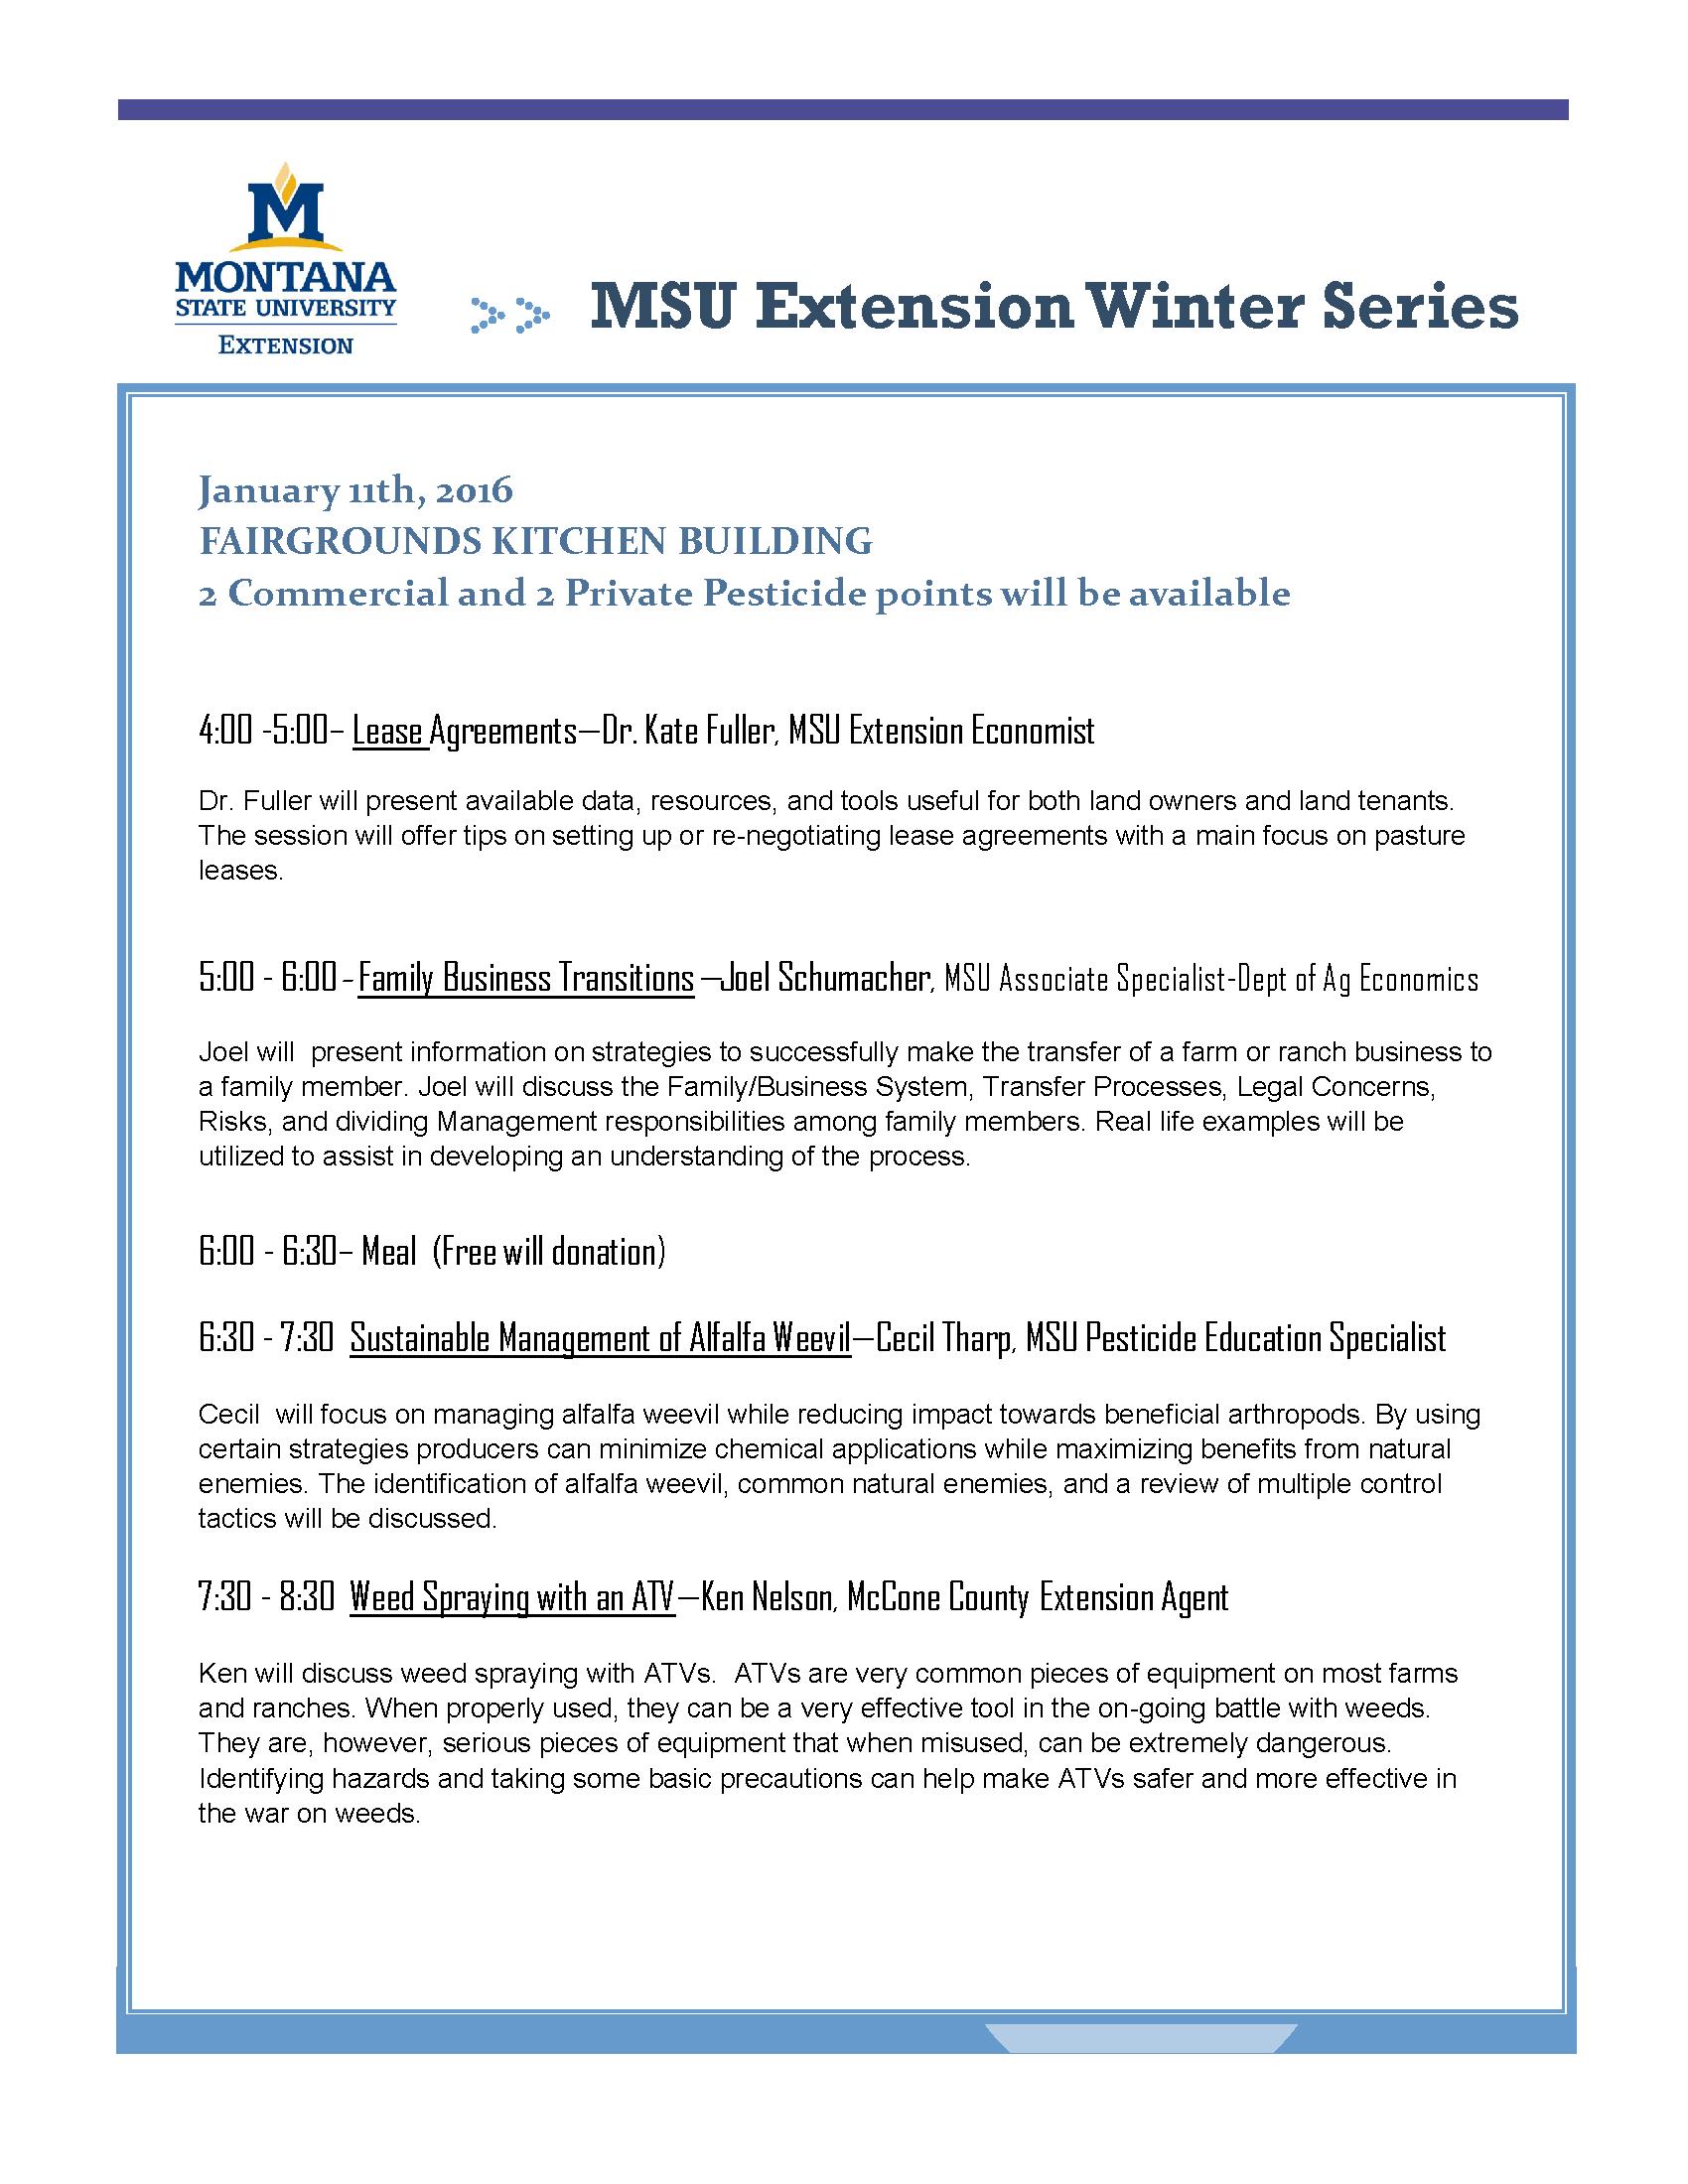 Montana mccone county circle - January 11 Msu Extension Winter Series